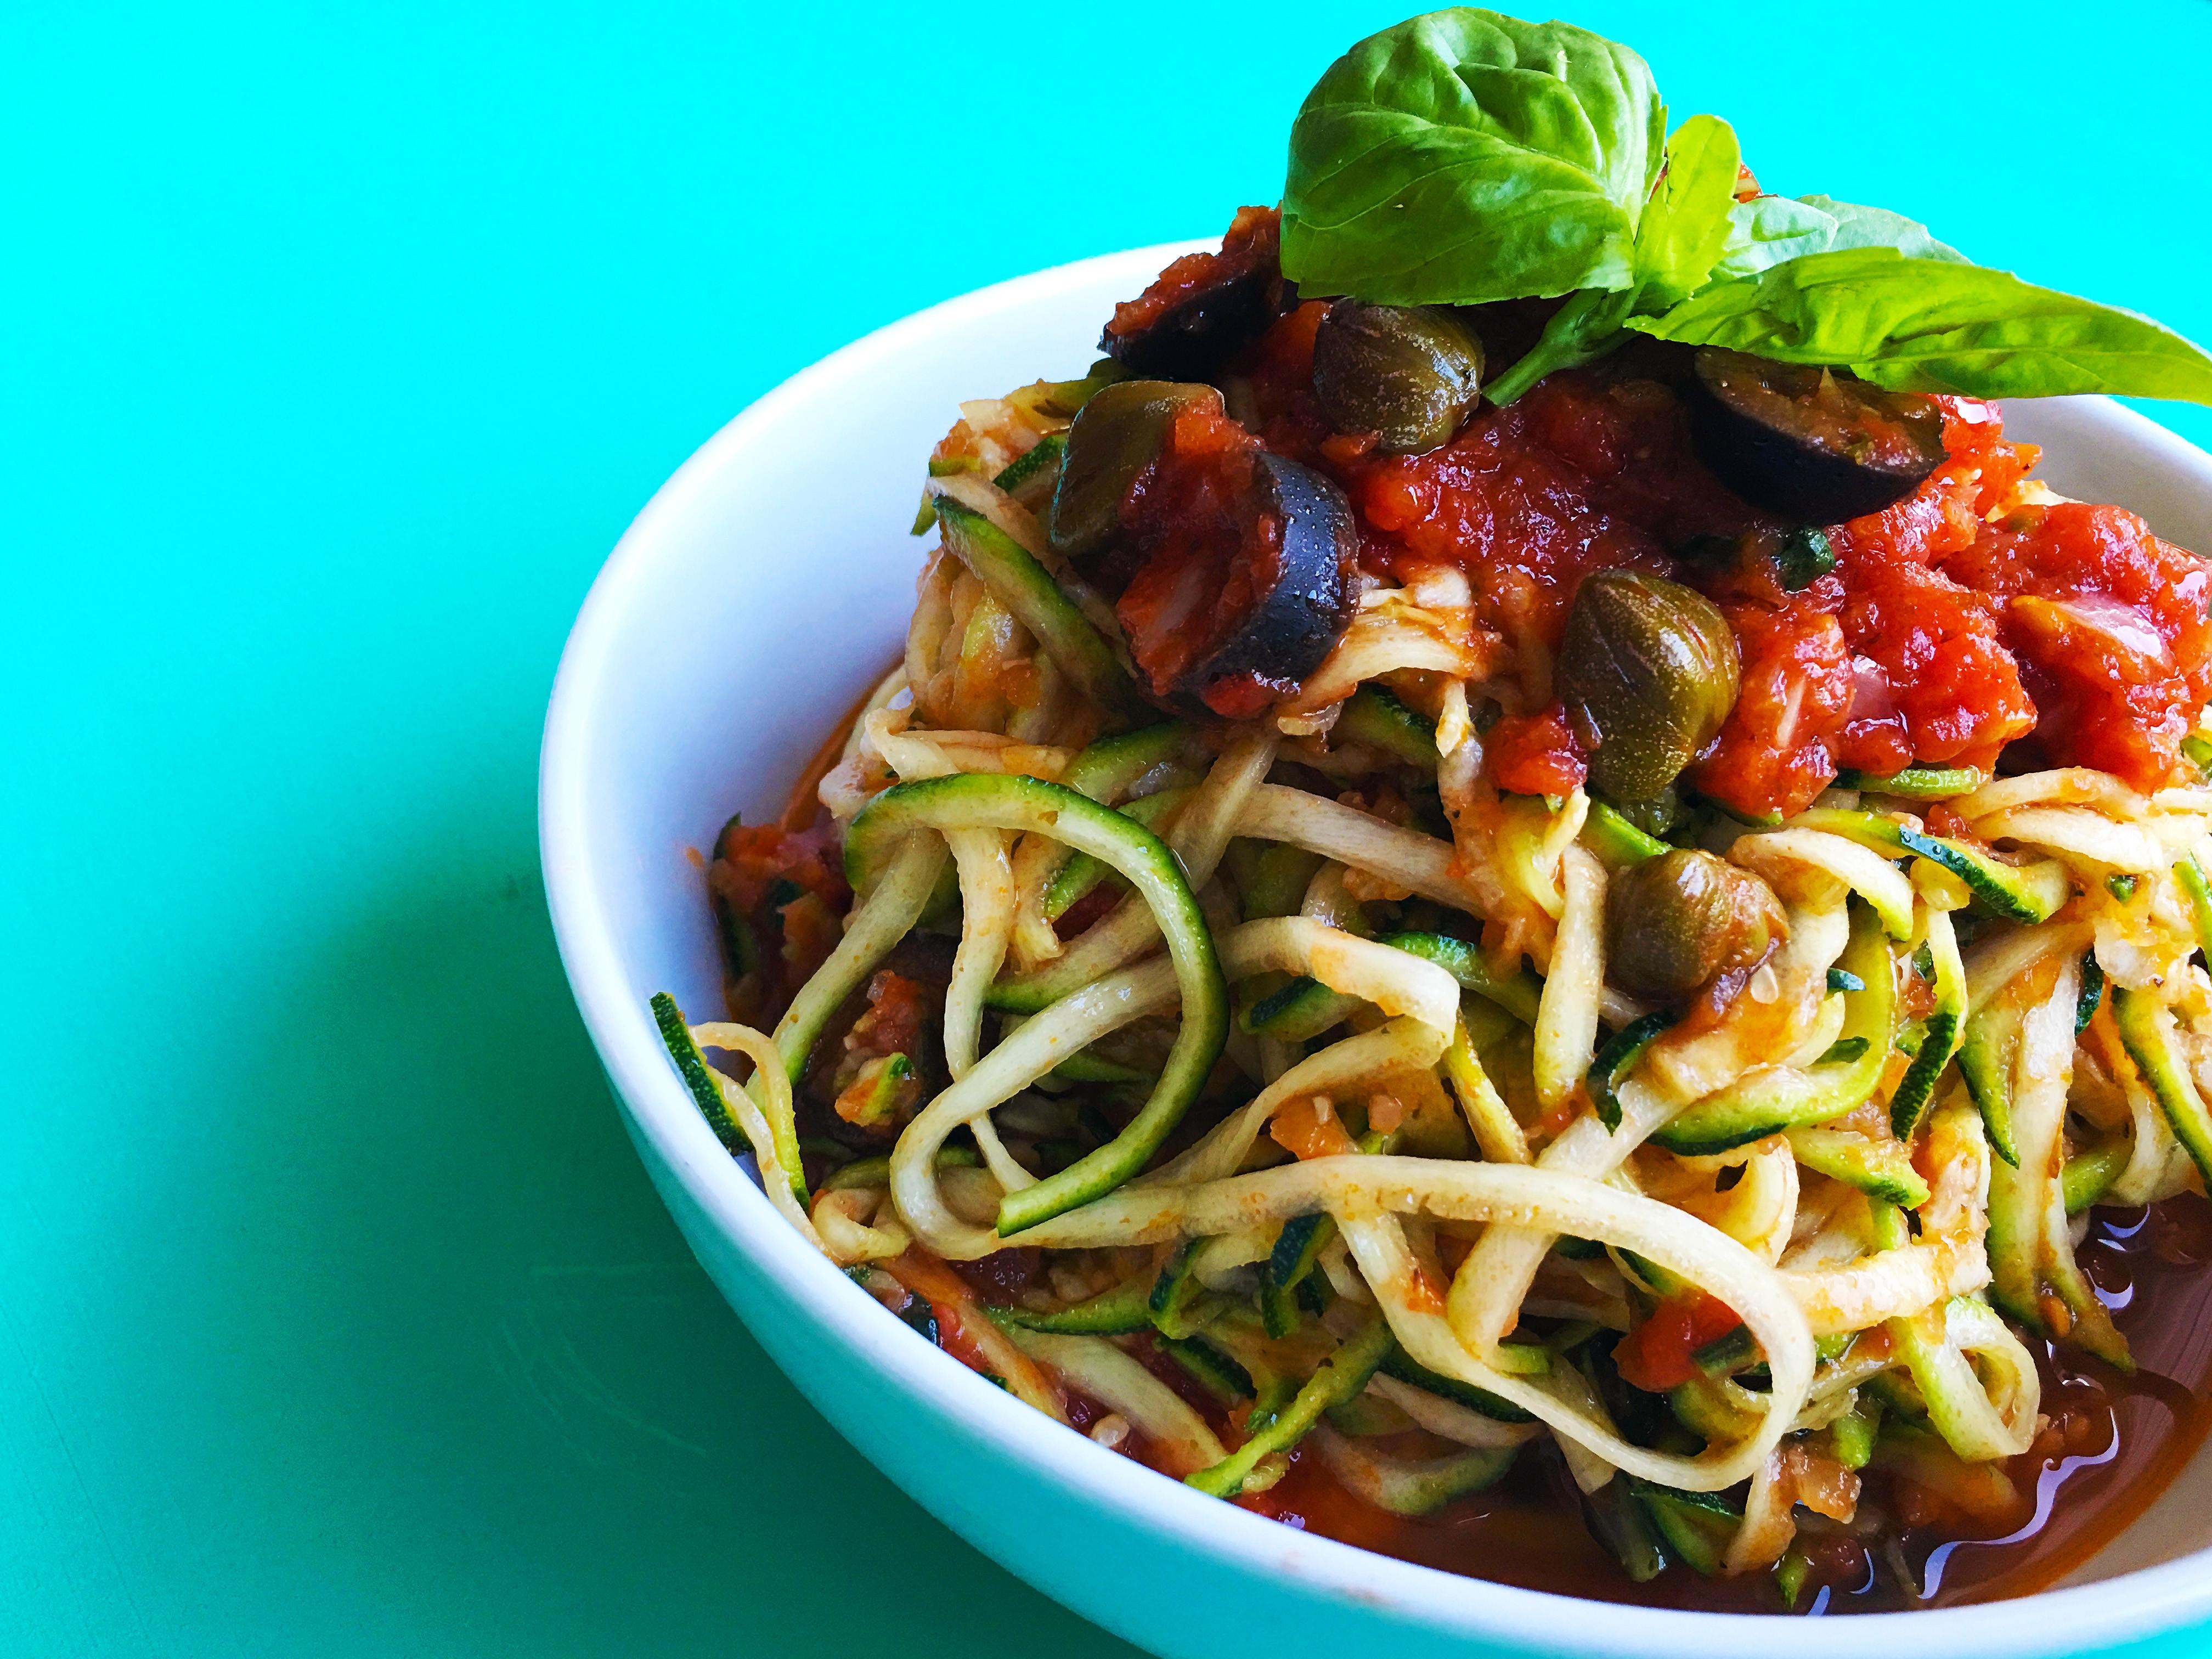 Vegetarian Paleo Recipes  Paleo Pasta Recipe Cour ti with Vegan Puttanesca Sauce